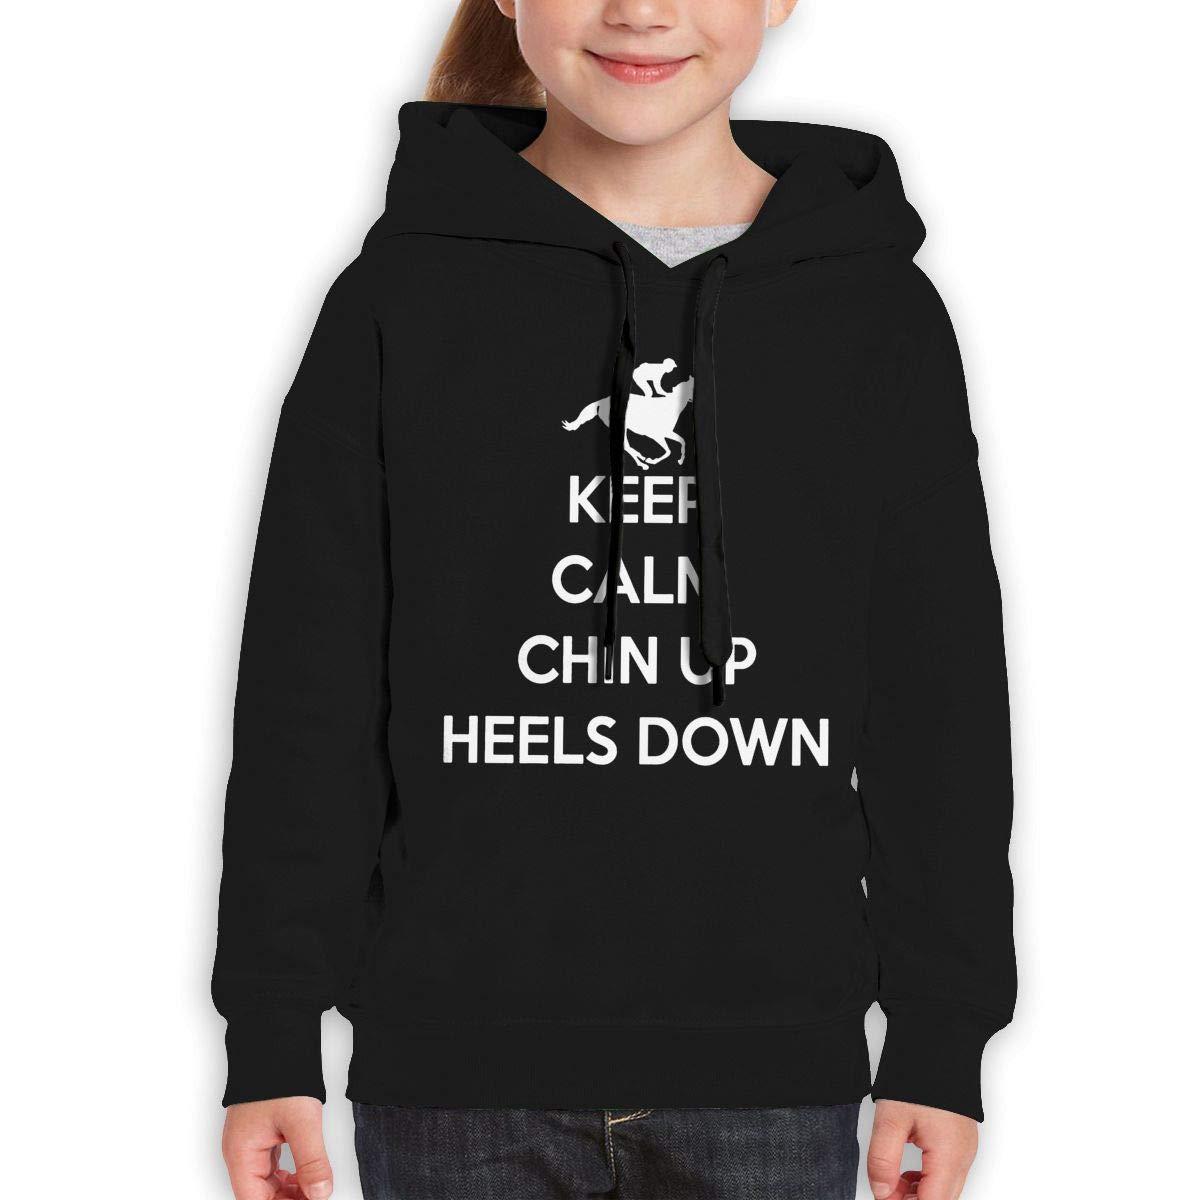 Boys Girls Keep Calm Chin Up Heels Down Teen Youth Hoody Black